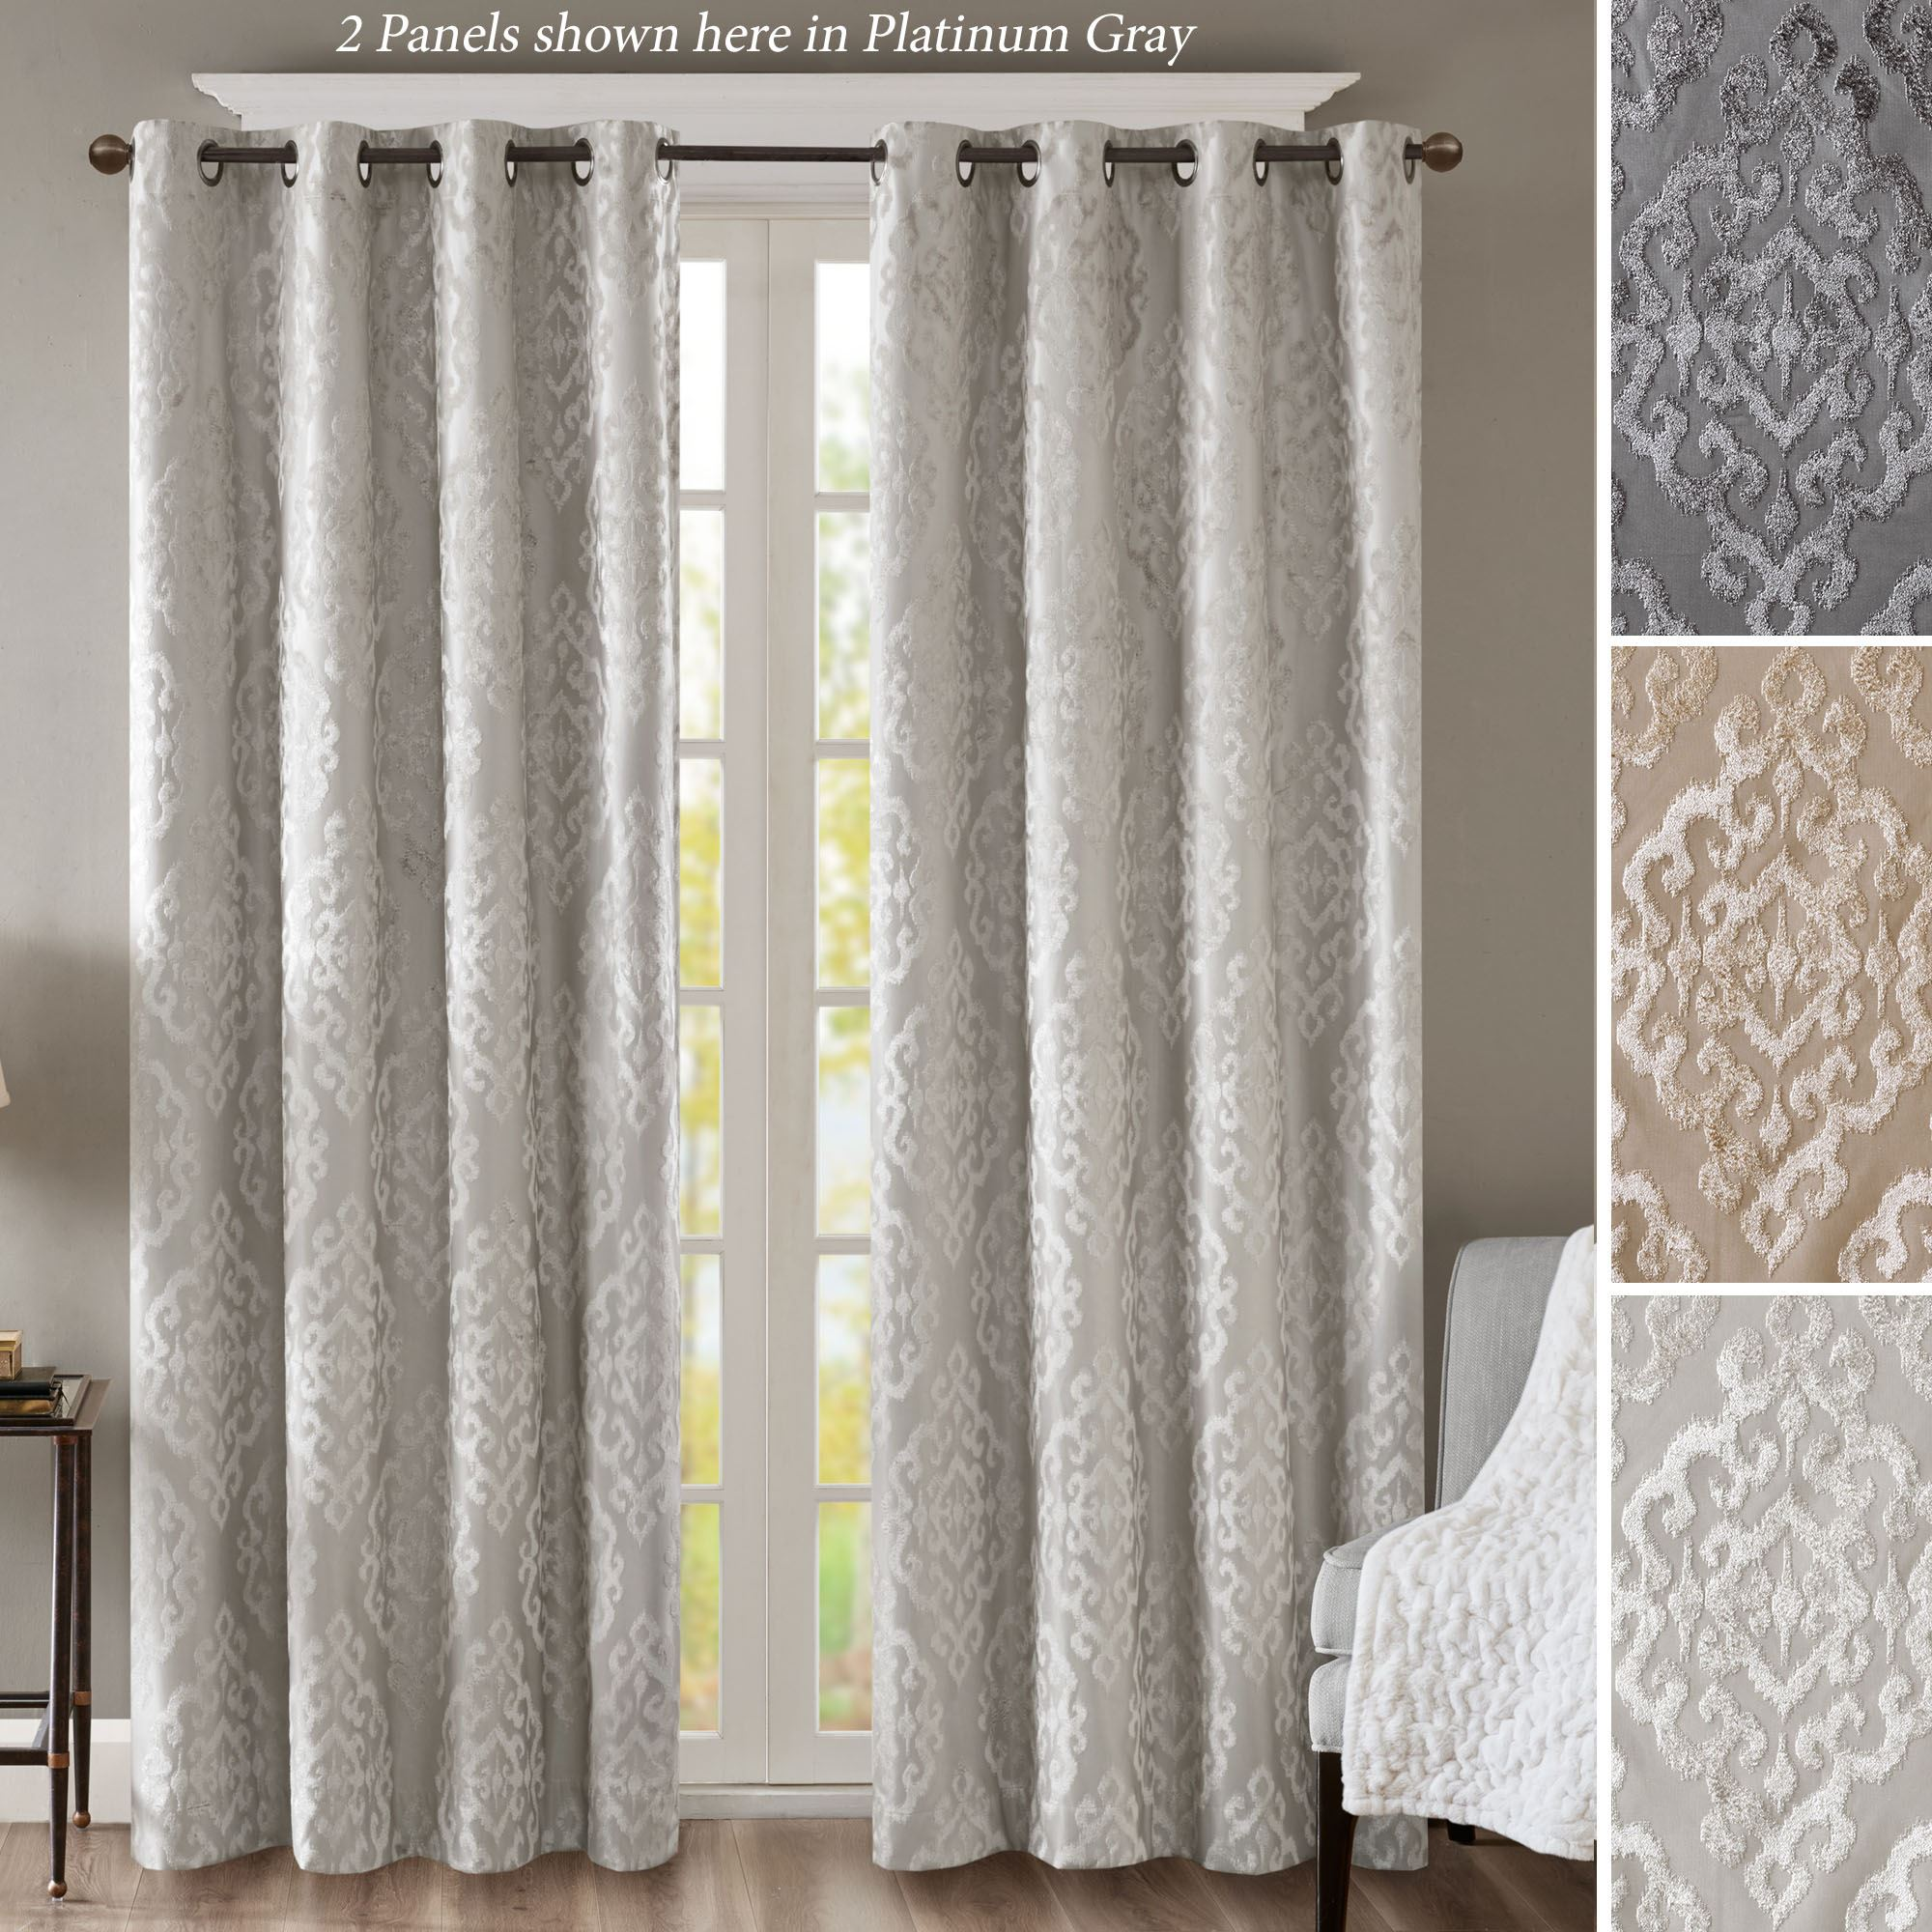 mirage sunsmart thermal blackout grommet curtain panel